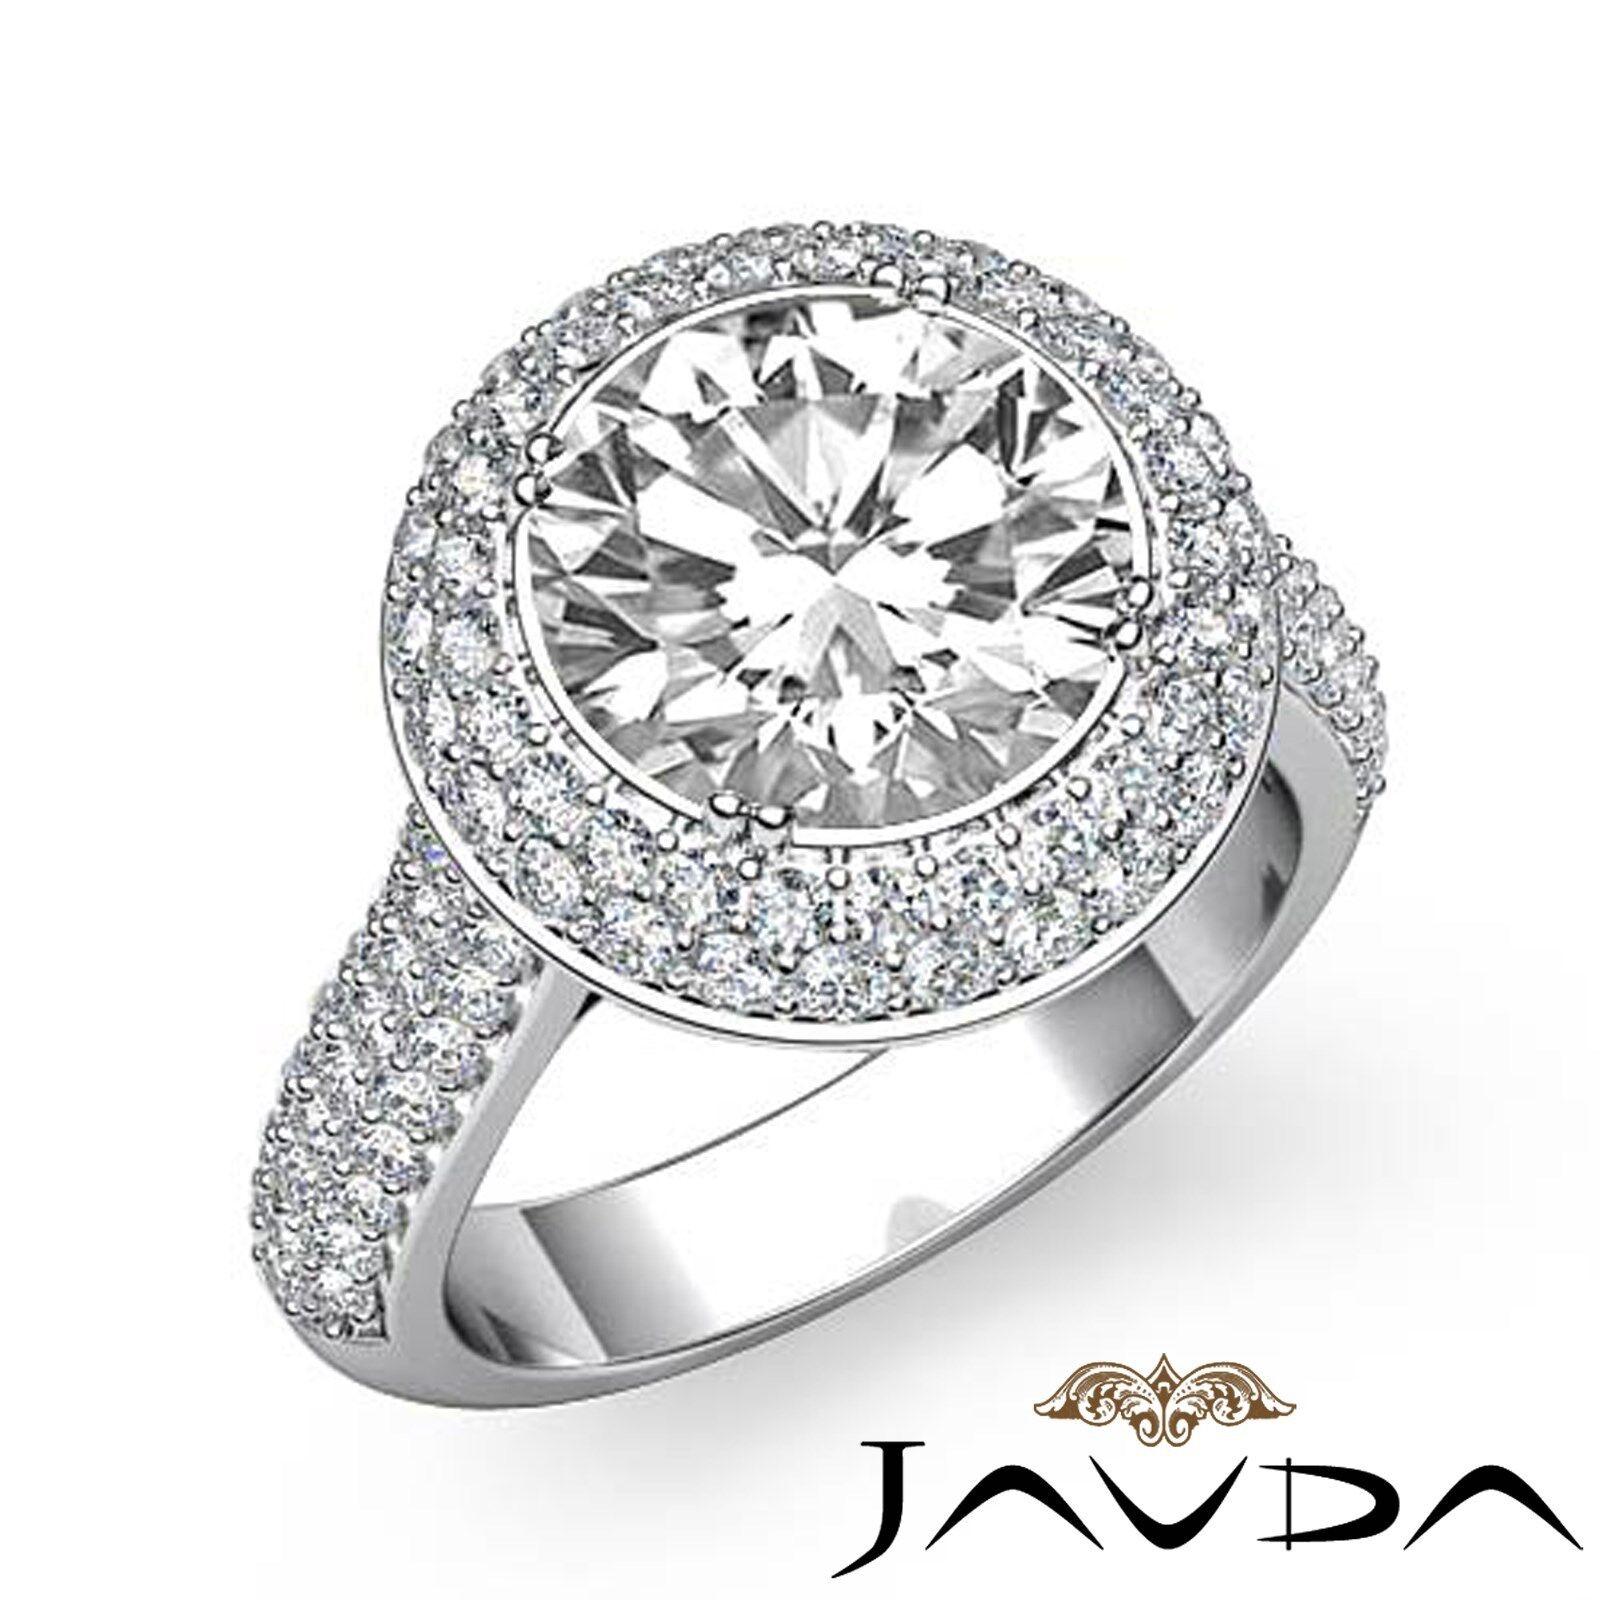 Double Halo Prong Setting Round Diamond Engagement Wedding Ring GIA F VS1 3 Ct